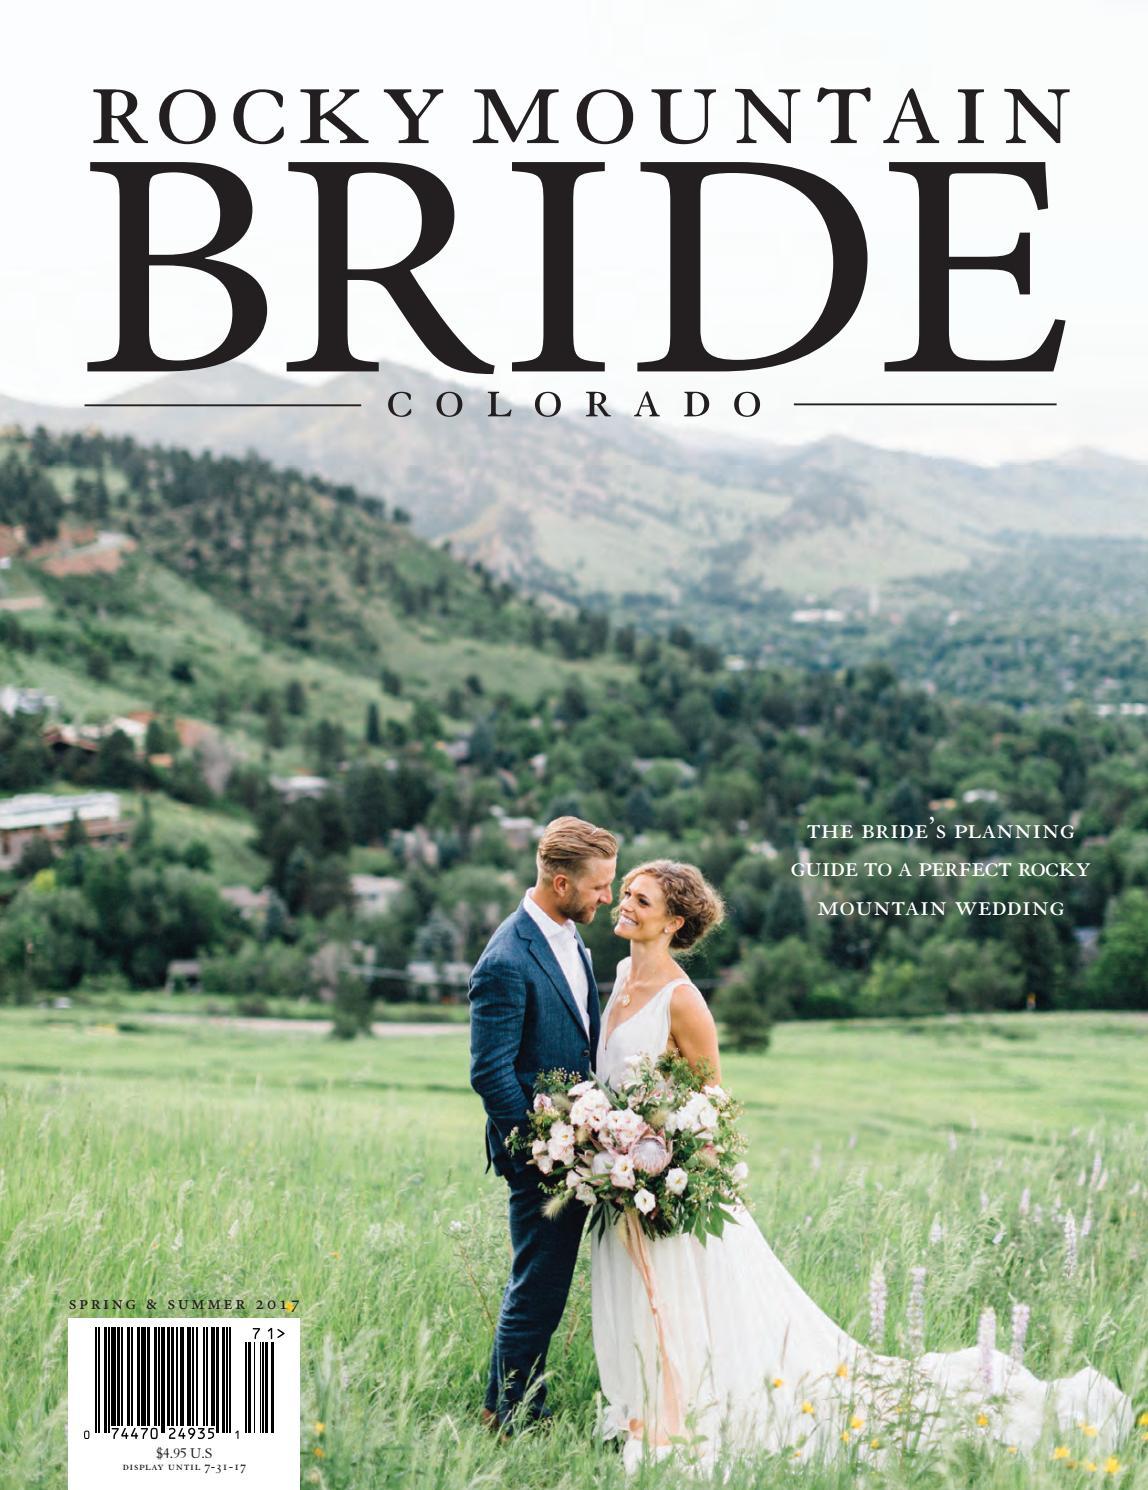 Rocky Mountain Bride Colorado Spring & Summer 2017 by Rocky Mountain Bride  Magazine - issuu